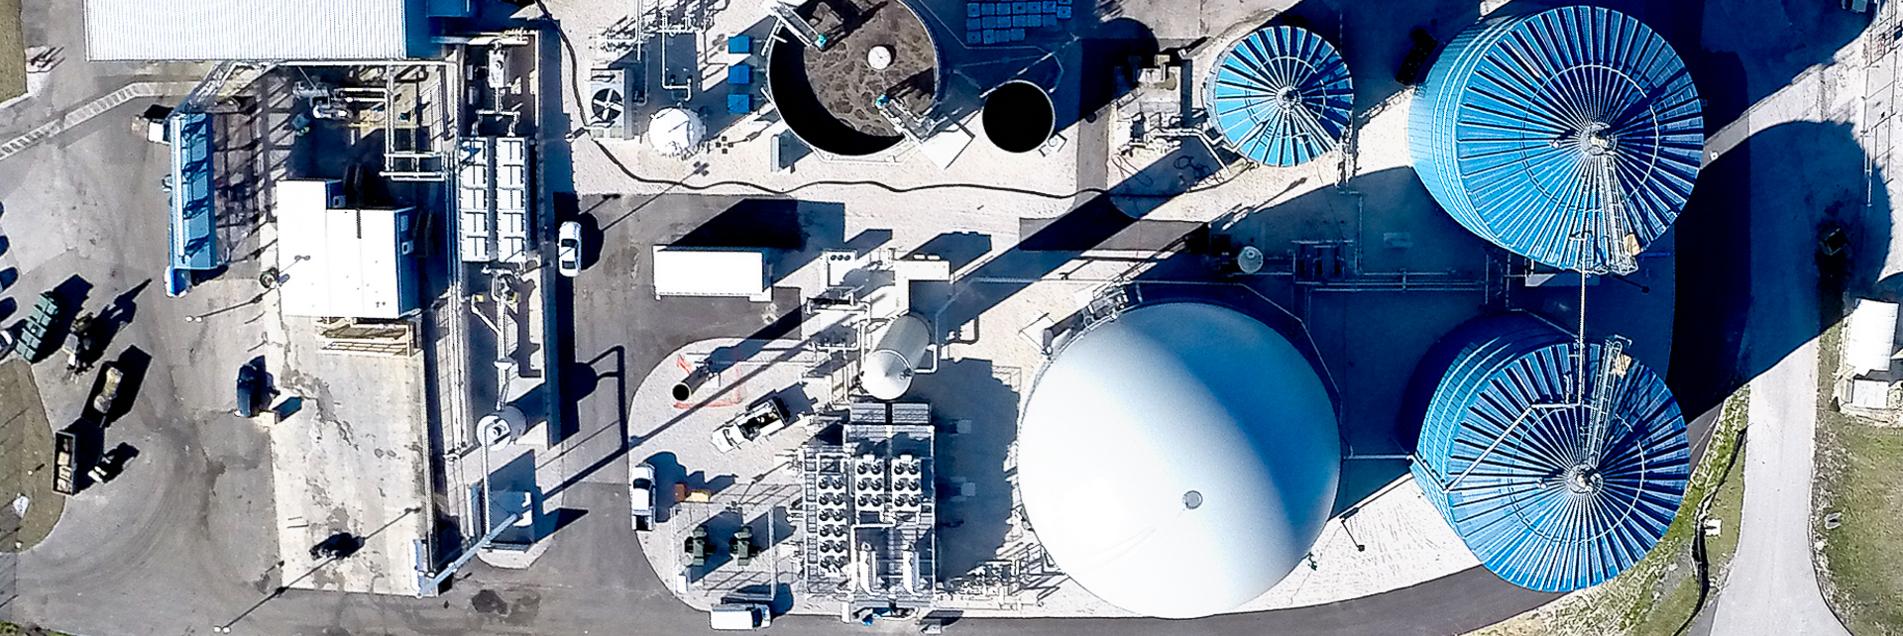 Harvest-Power-Orlando-Aerial1